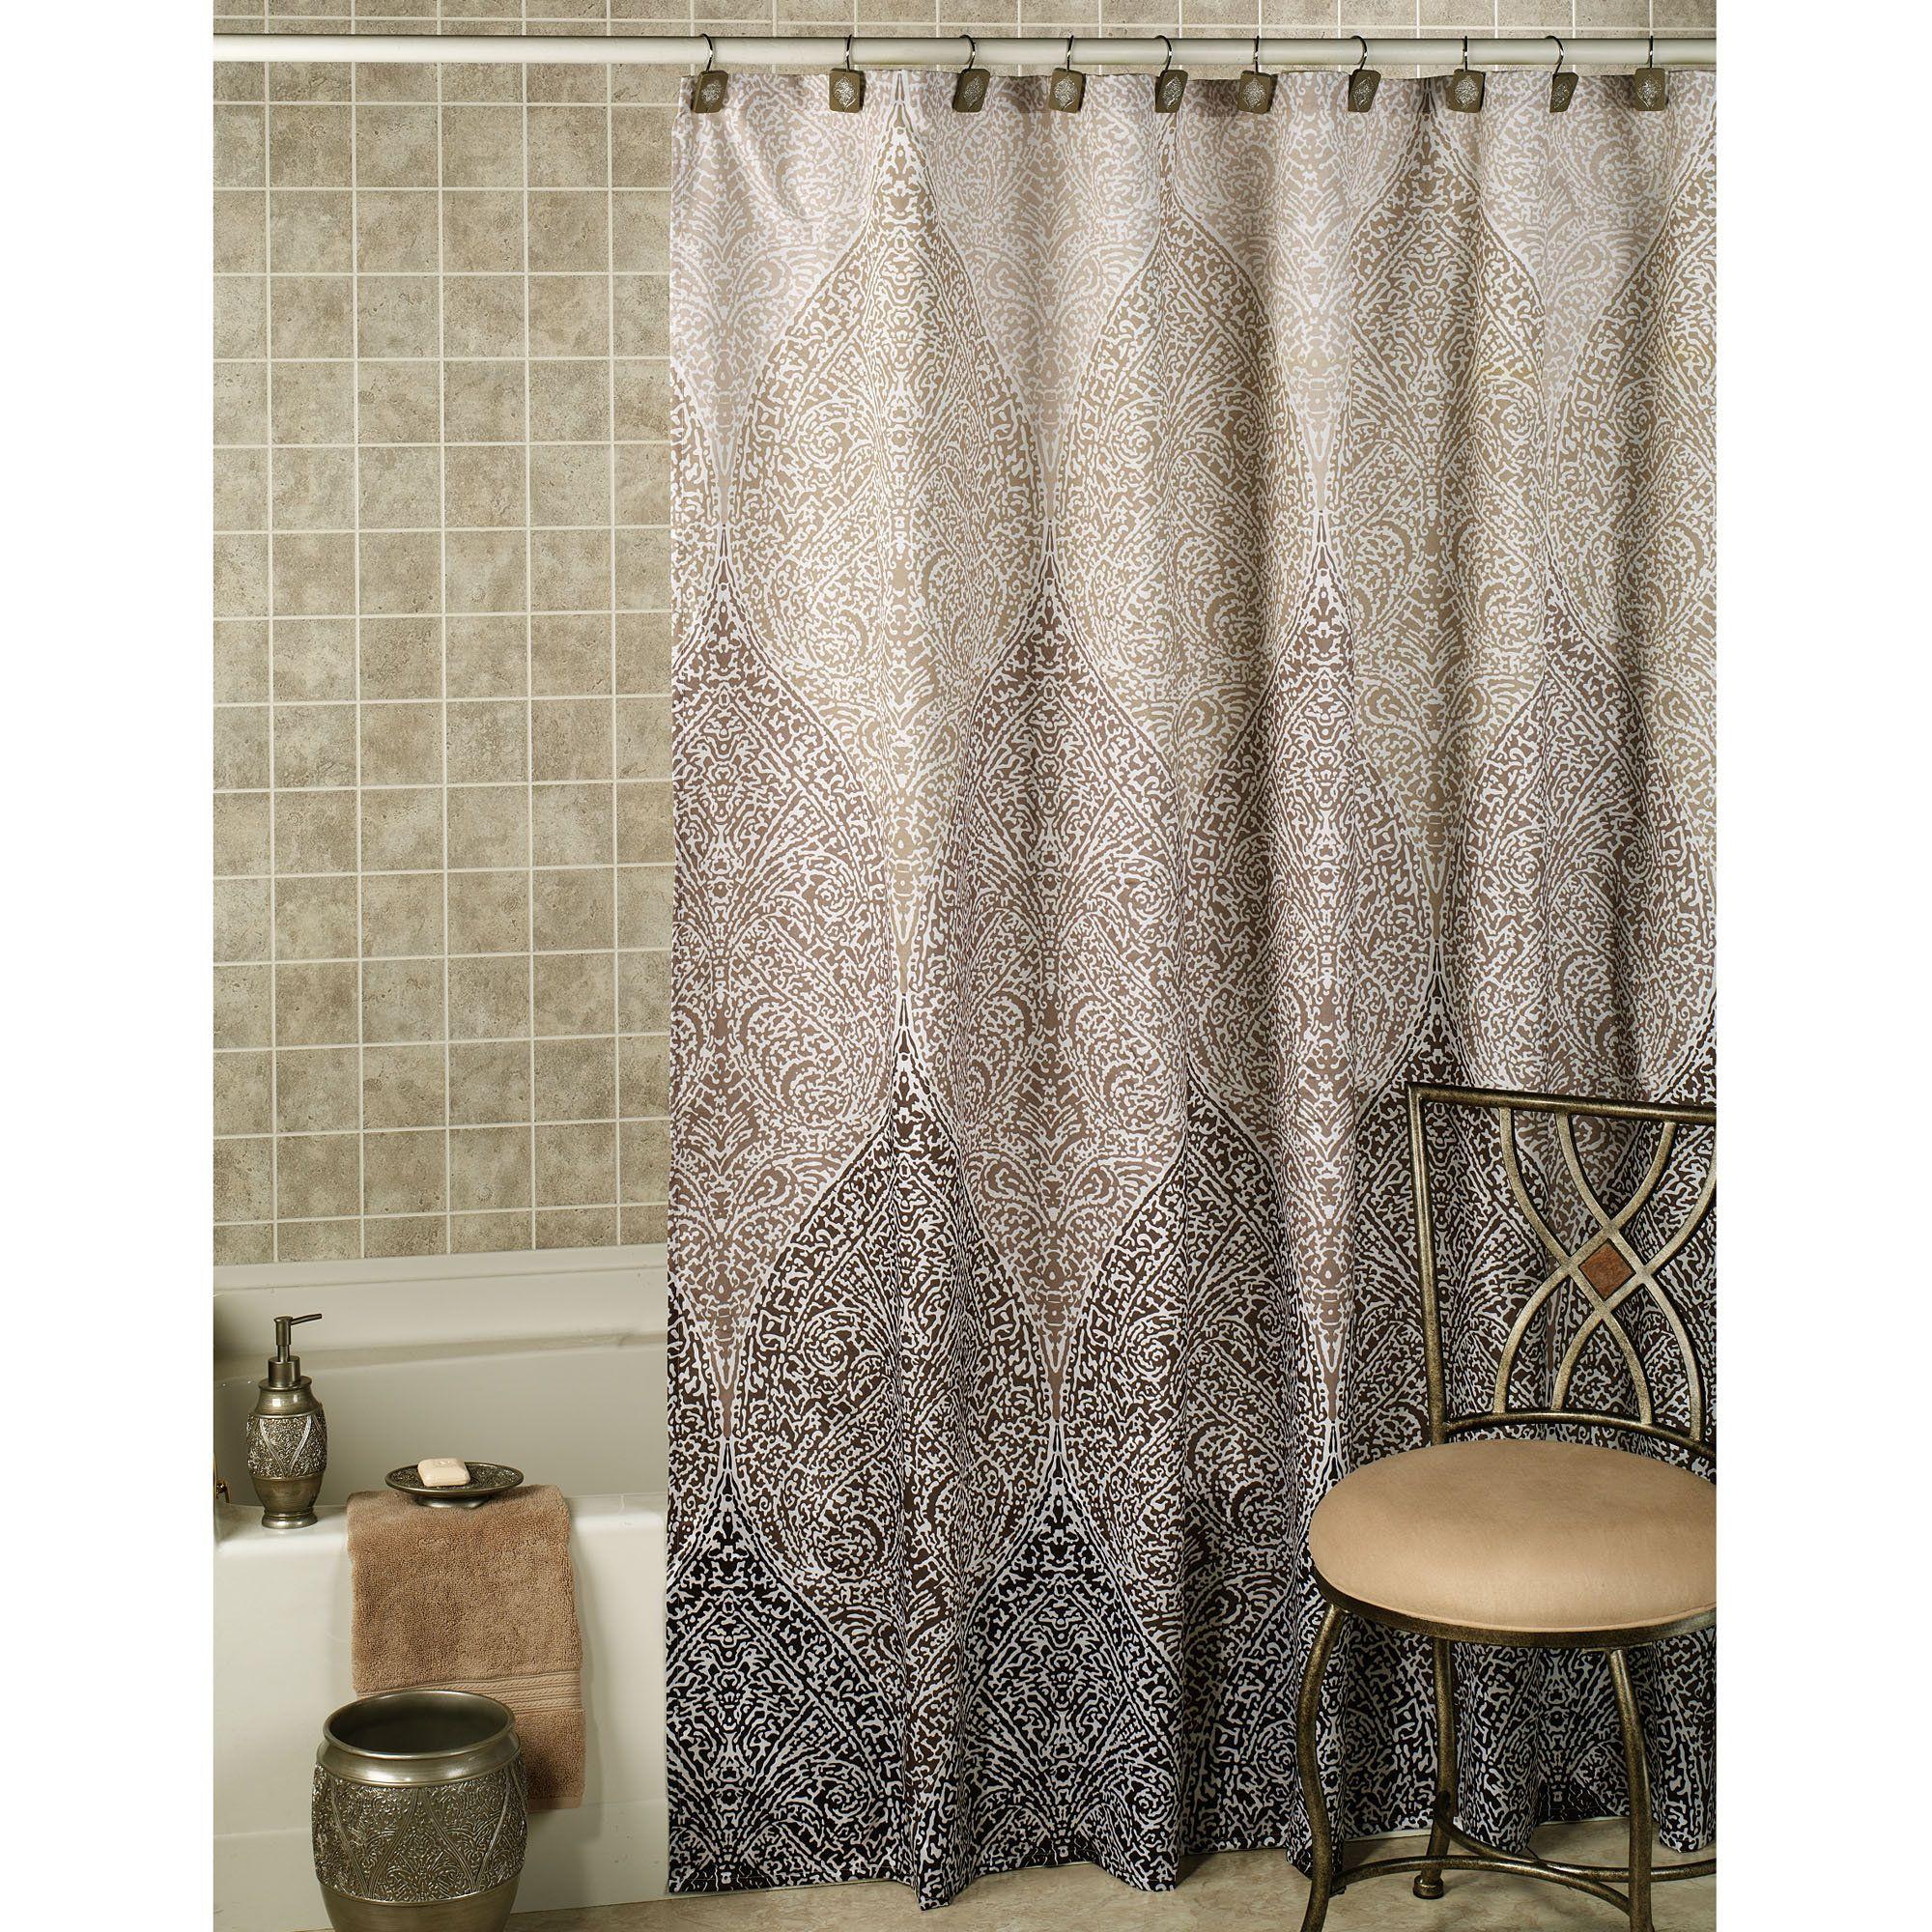 Casablanca Ombre Moroccan Design Shower Curtain